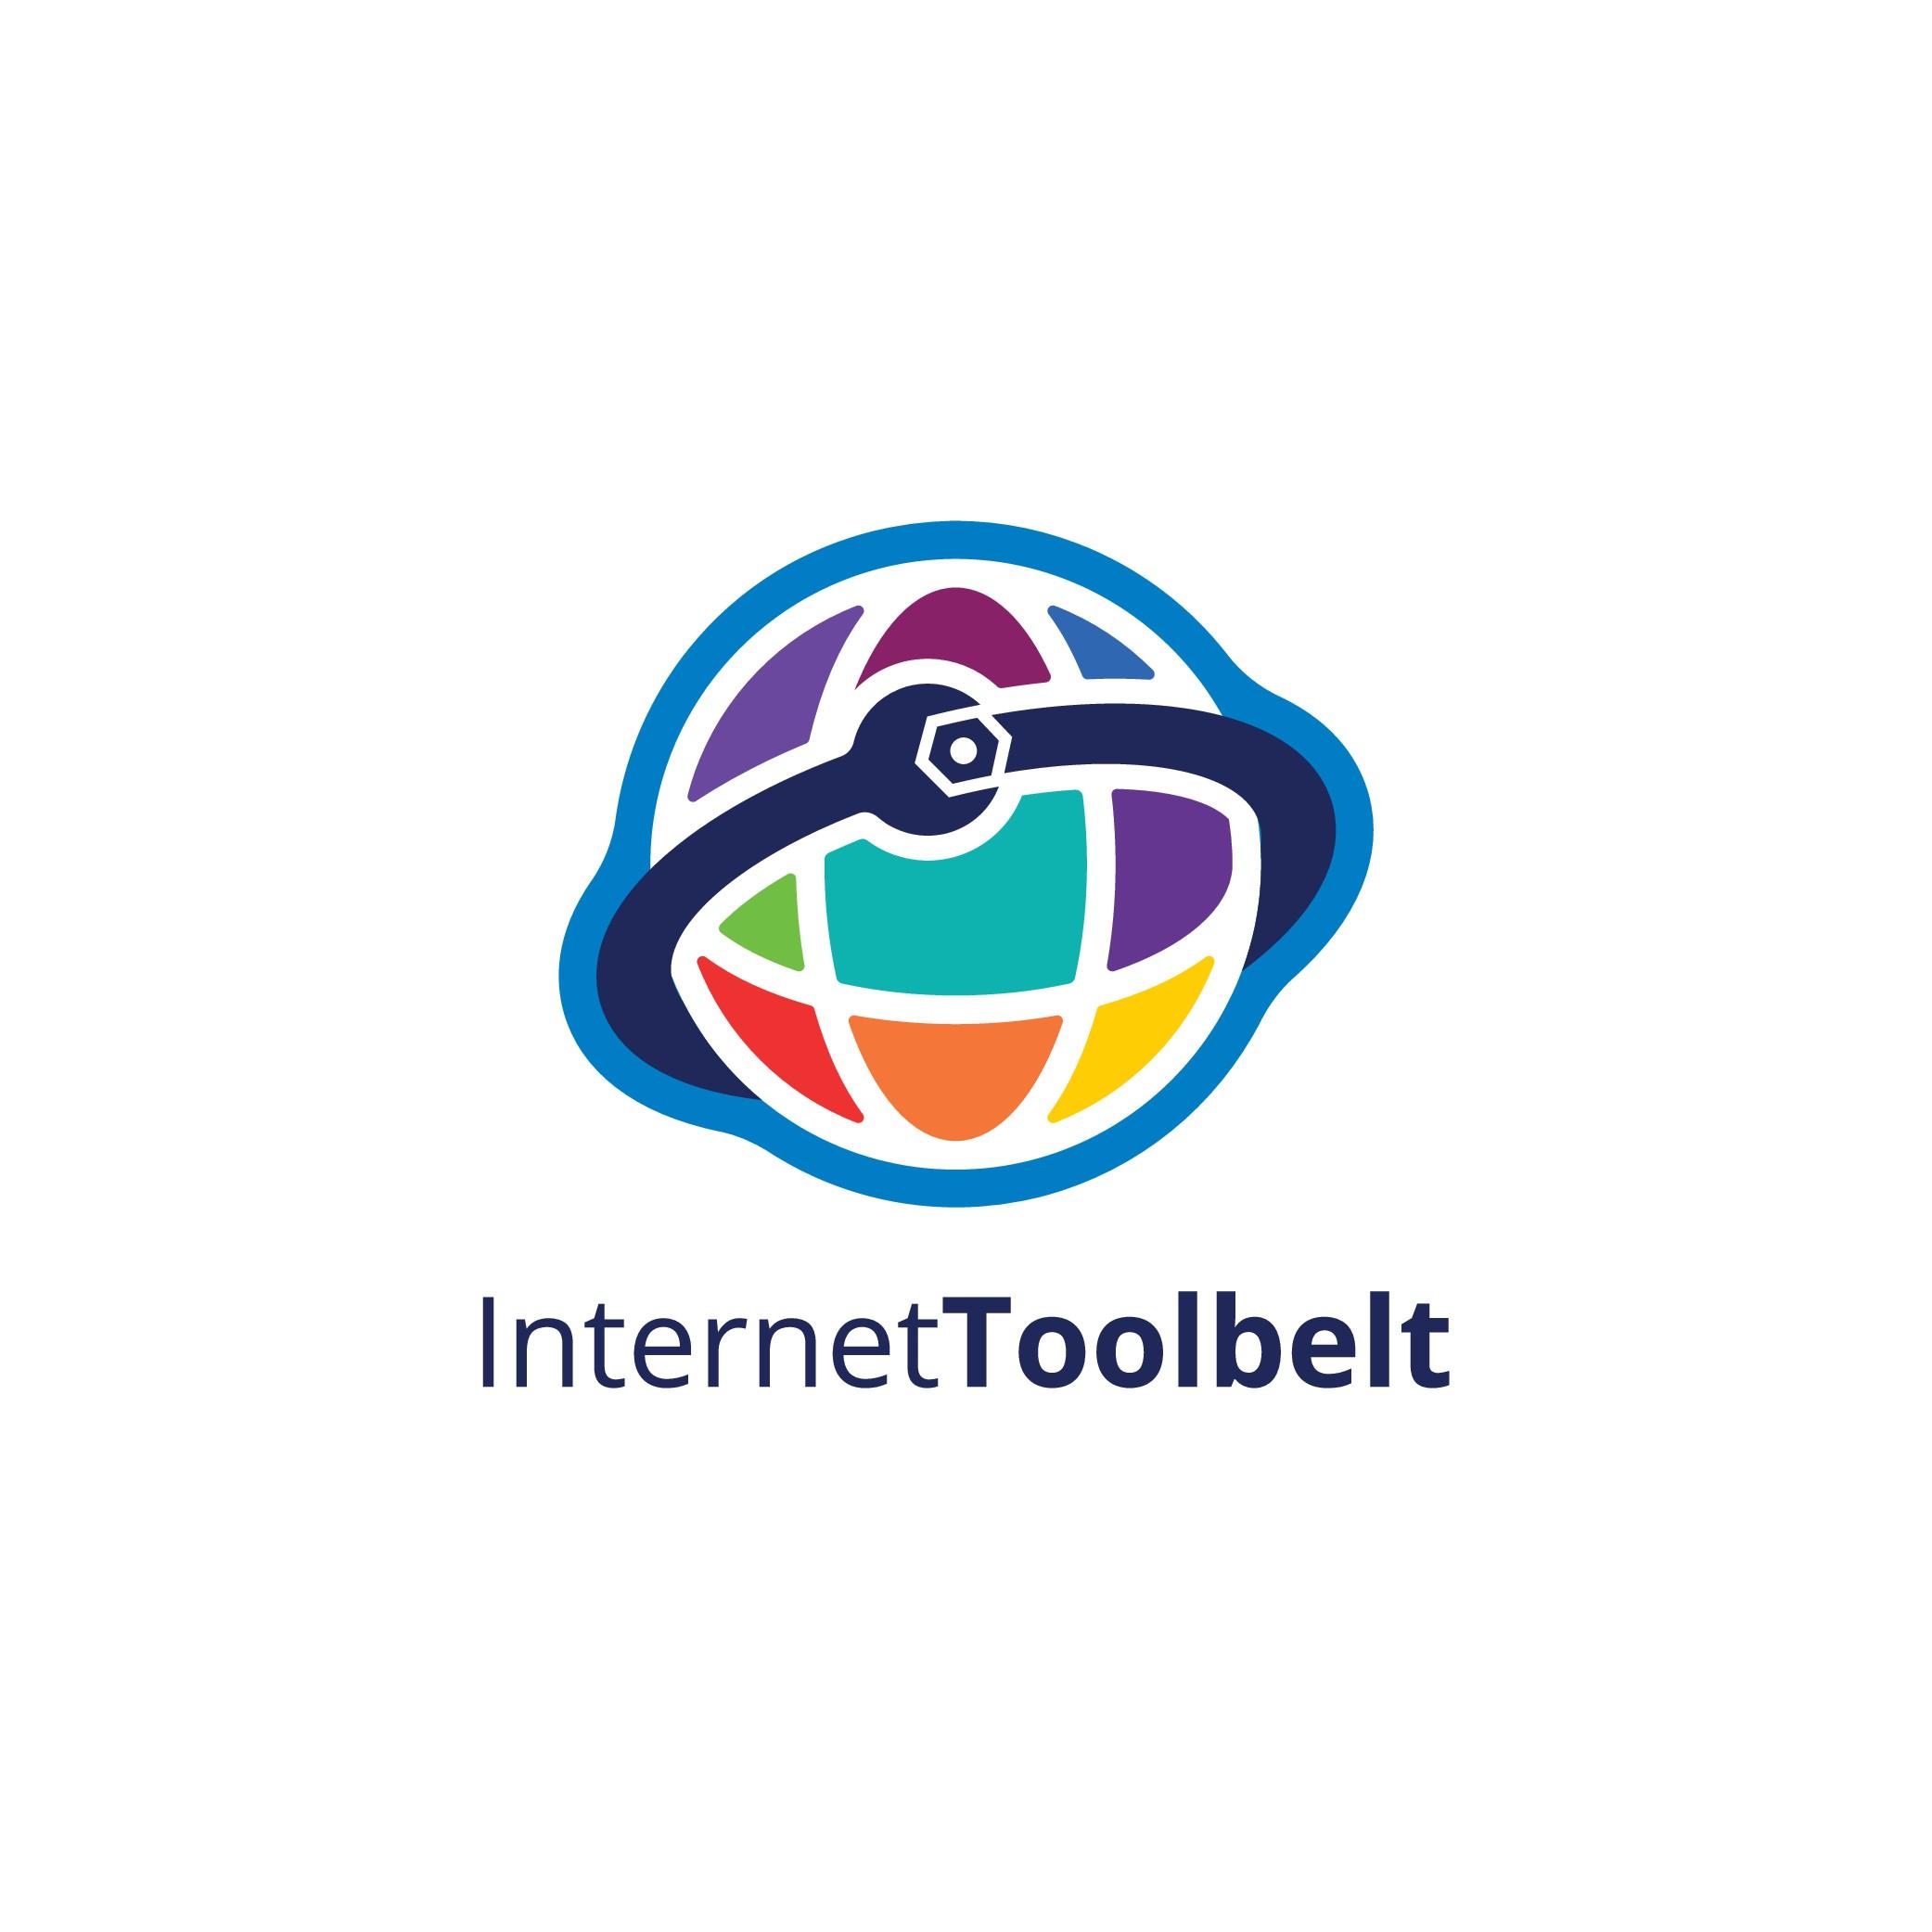 InternetToolbelt logo design - Crisp, clean logo